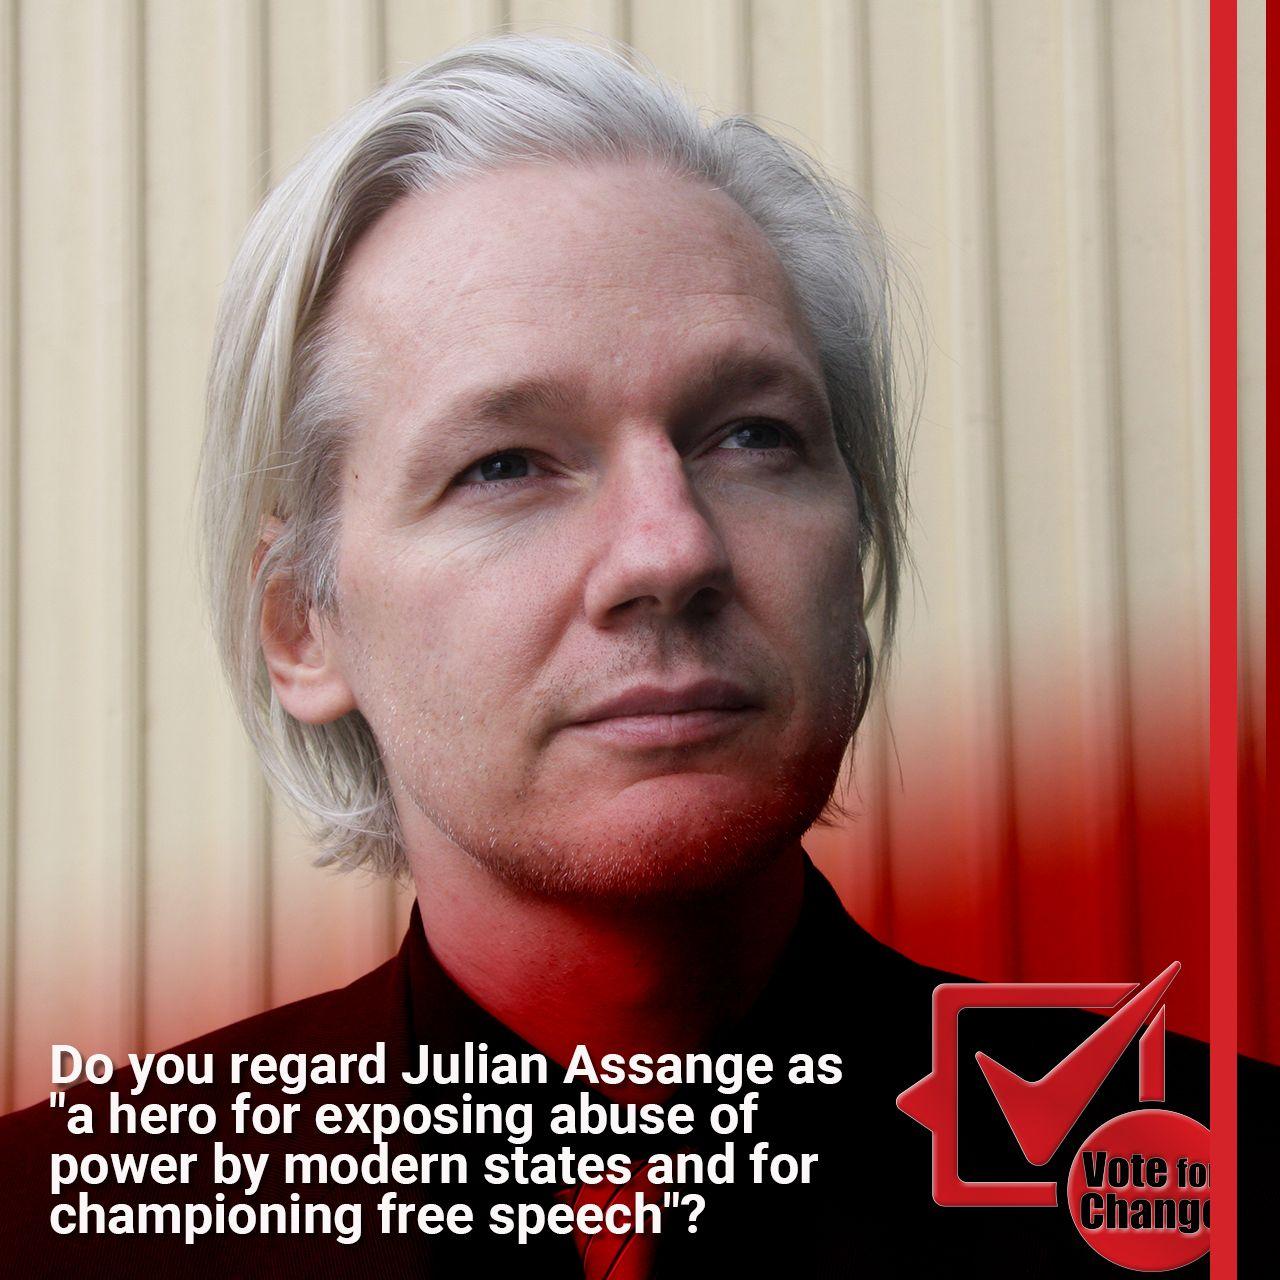 Julian Assange Faces US Extradition After Arrest In London